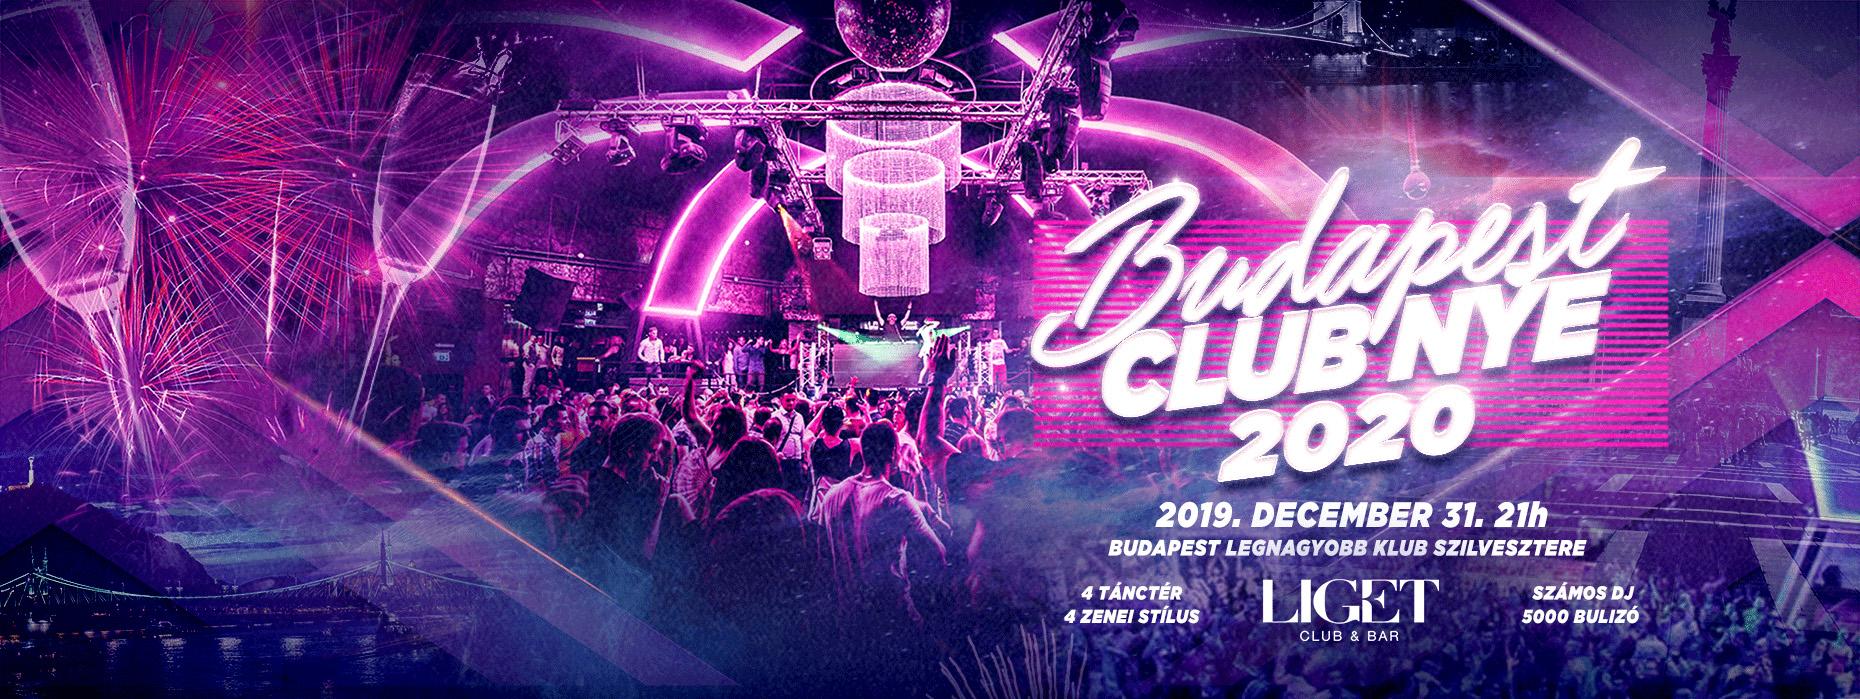 BUDAPEST LIGET CLUB NYE PARTY